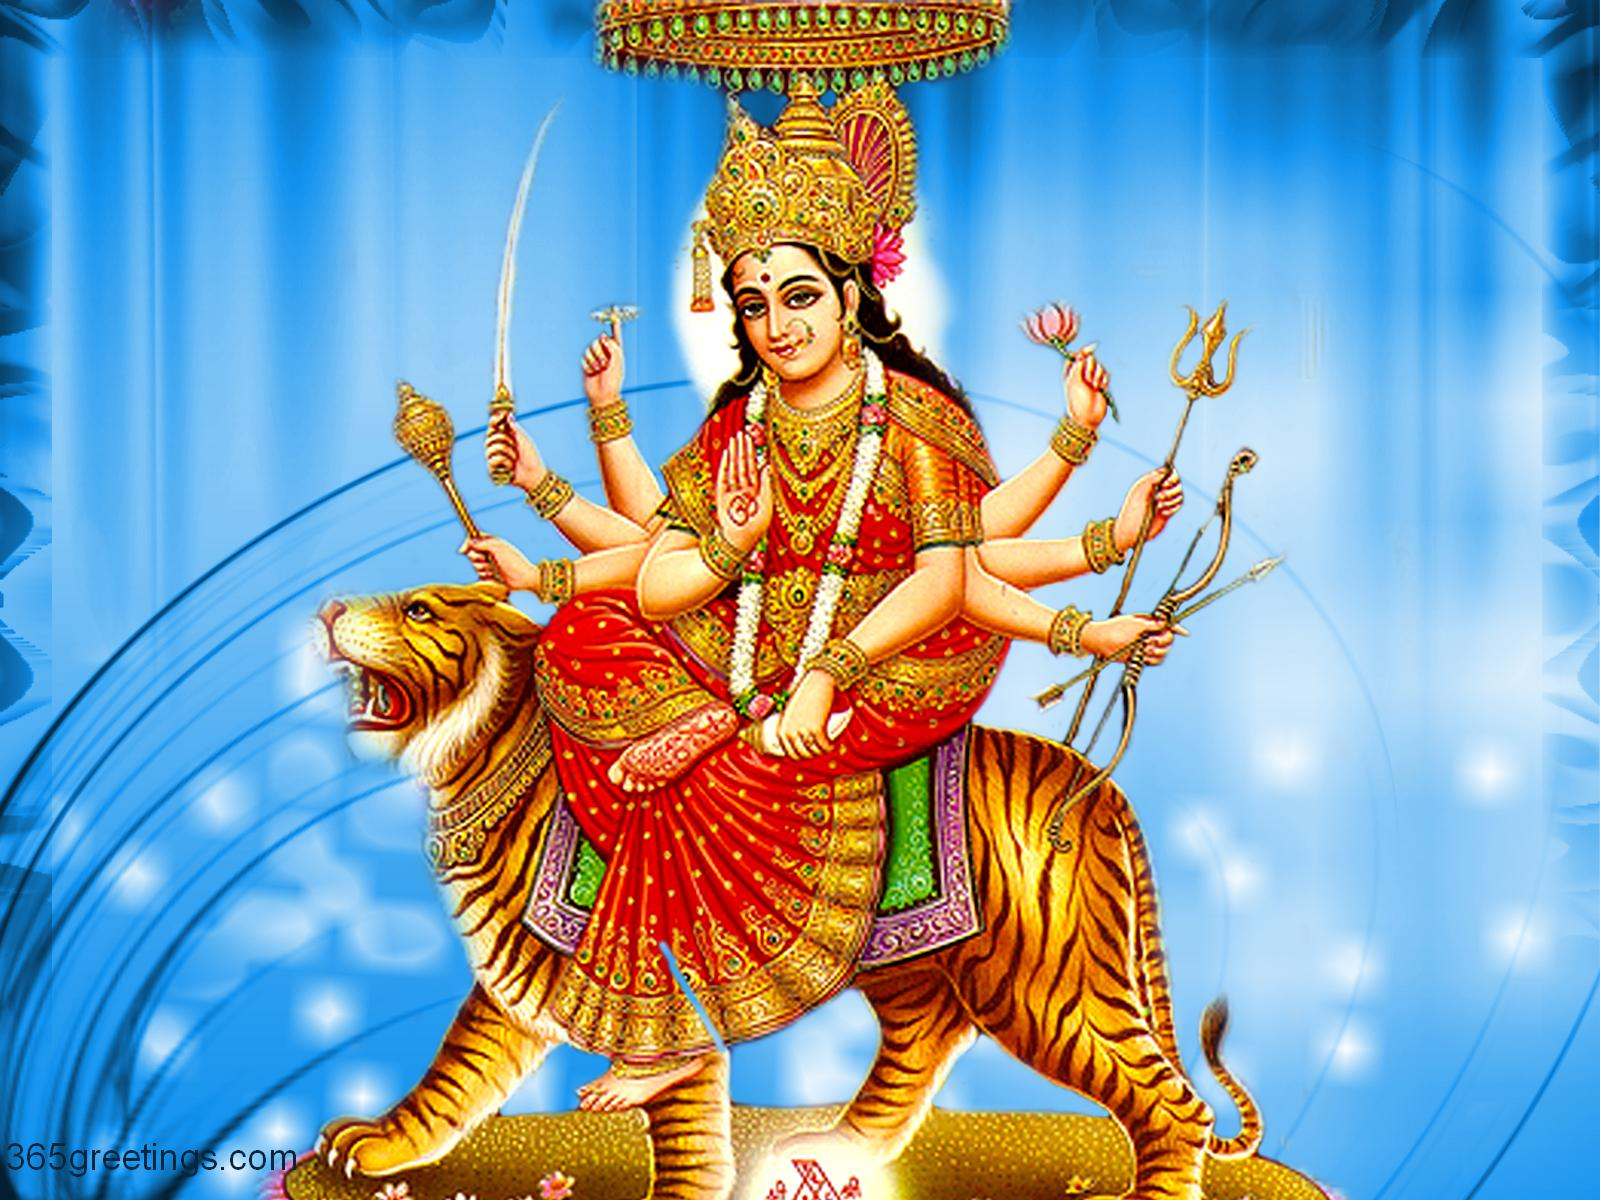 Durga Puja Hd Wallpaper: HD Durga Maa Wallpapers